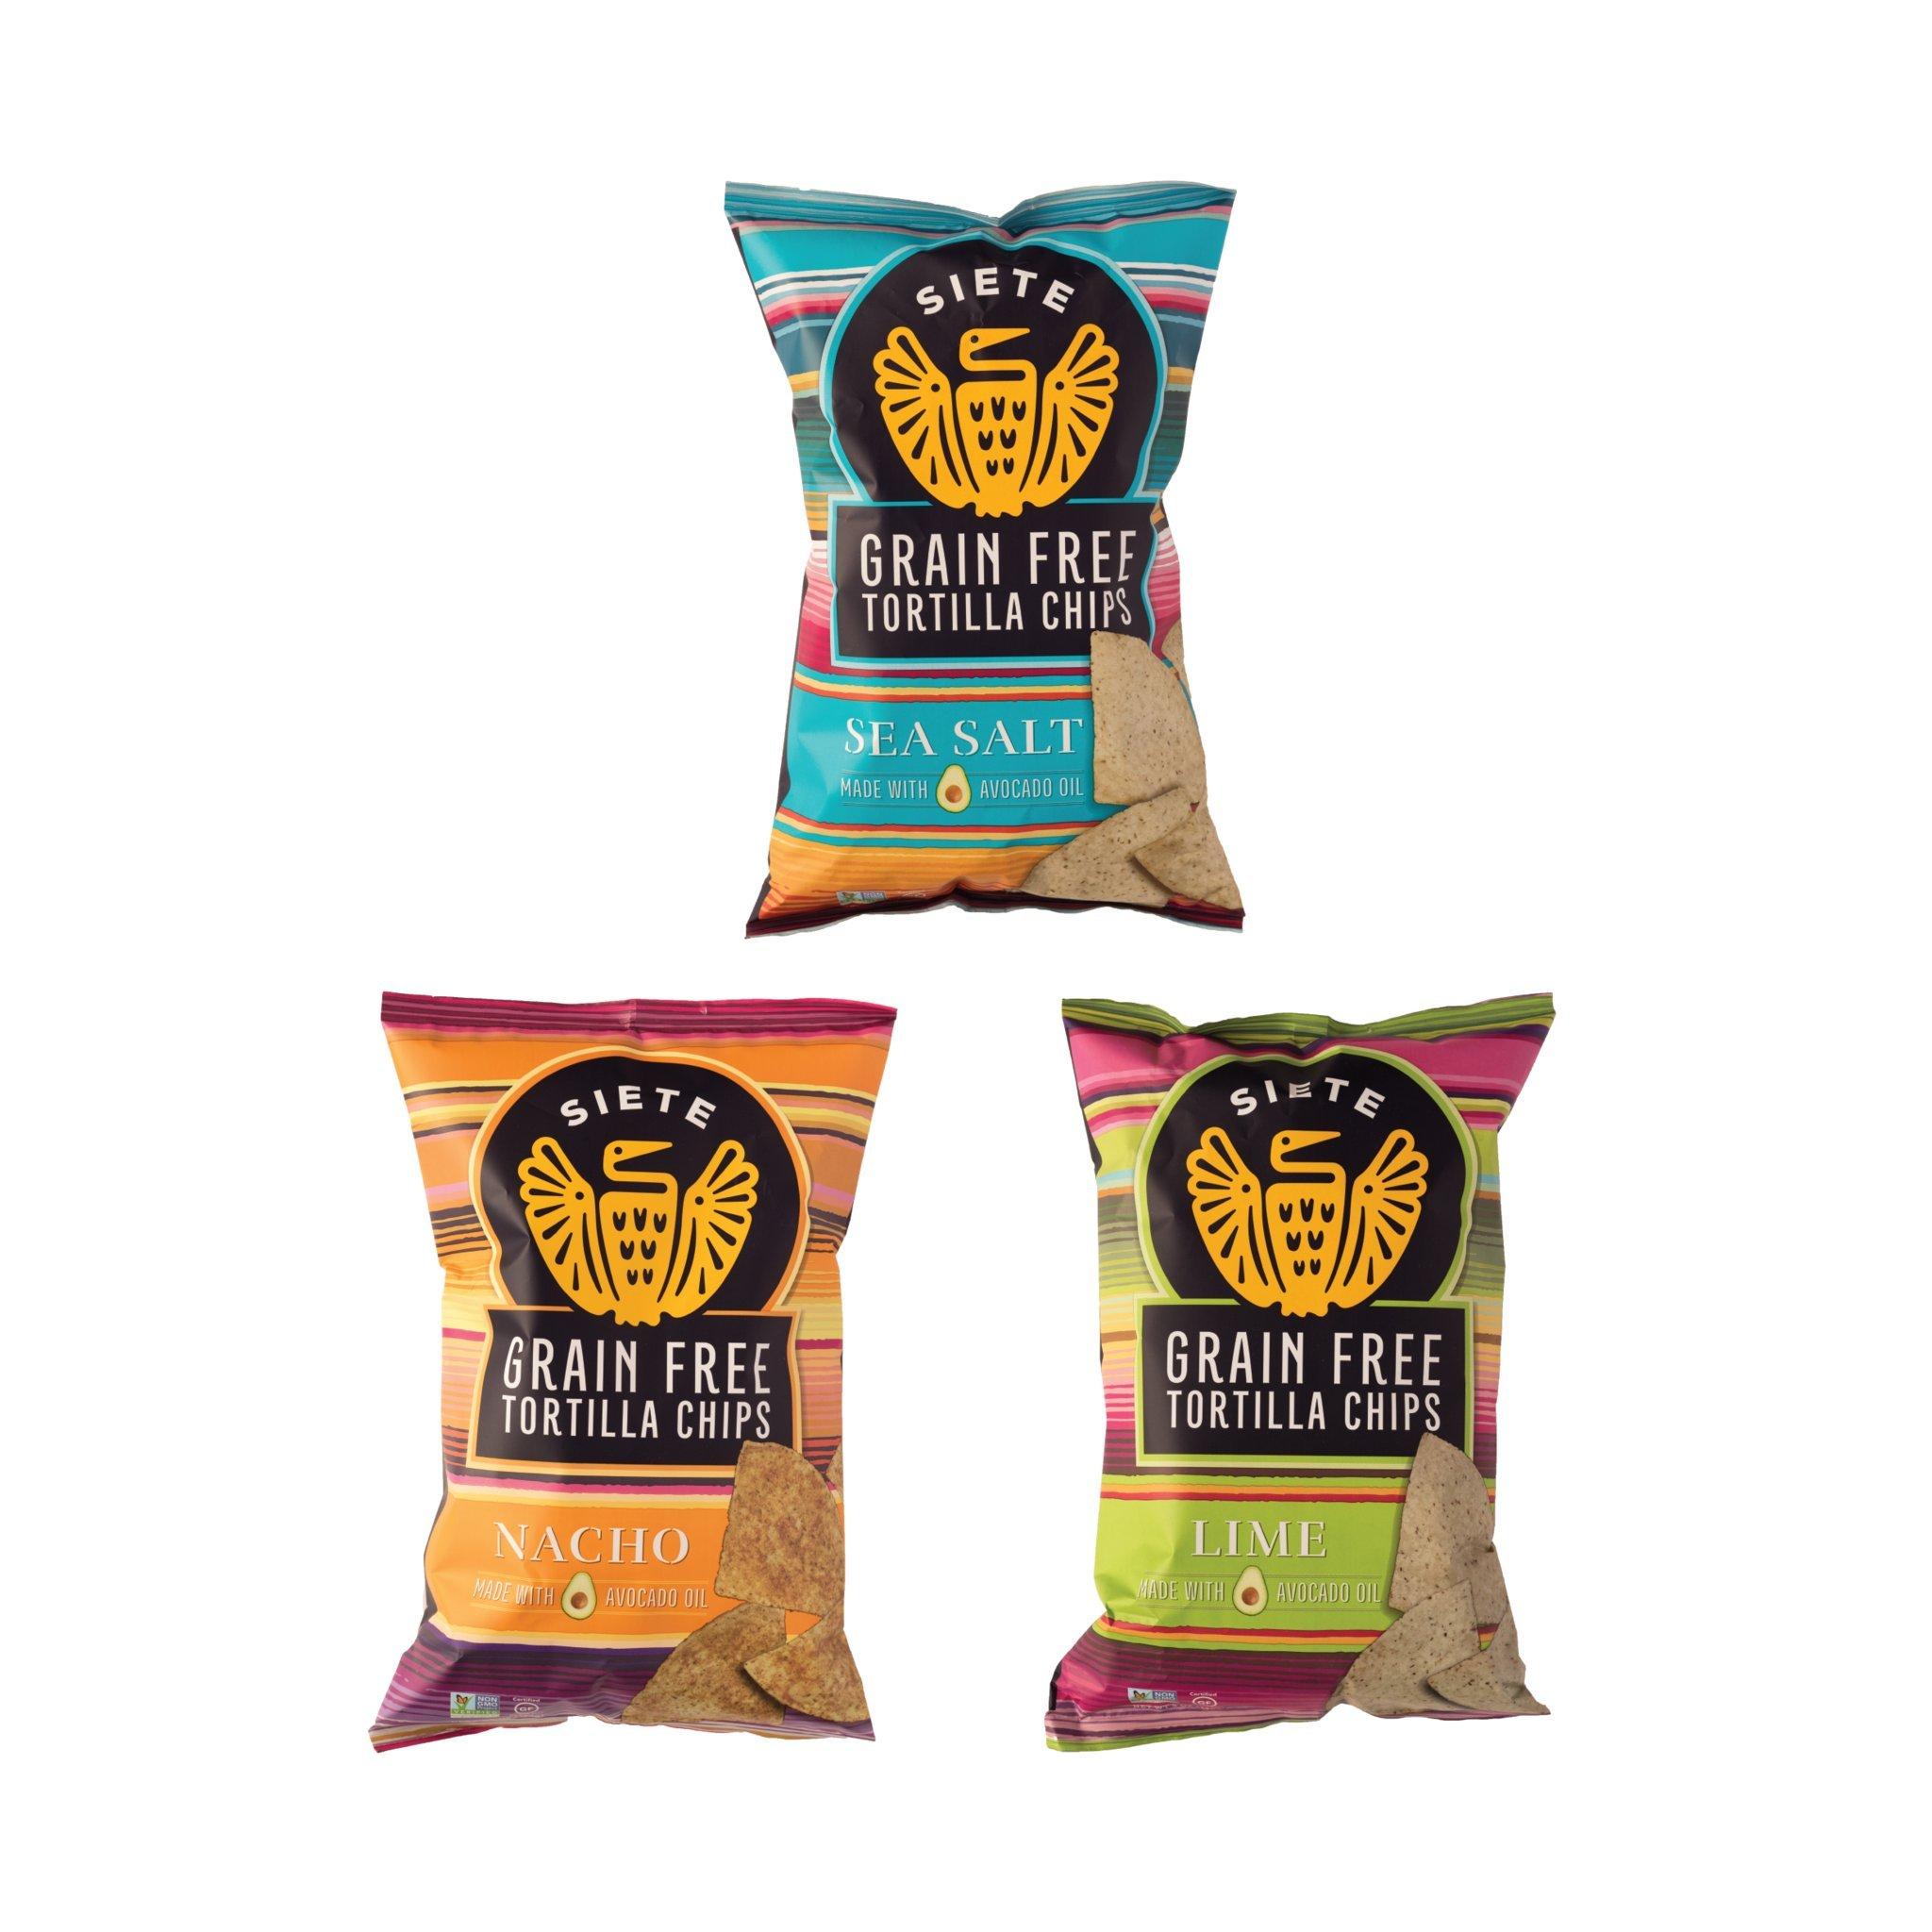 Siete Grain Free Tortilla Chips, 3 Bag (5 Ounce Each) Sampler of Nacho, Lime, Sea Salt